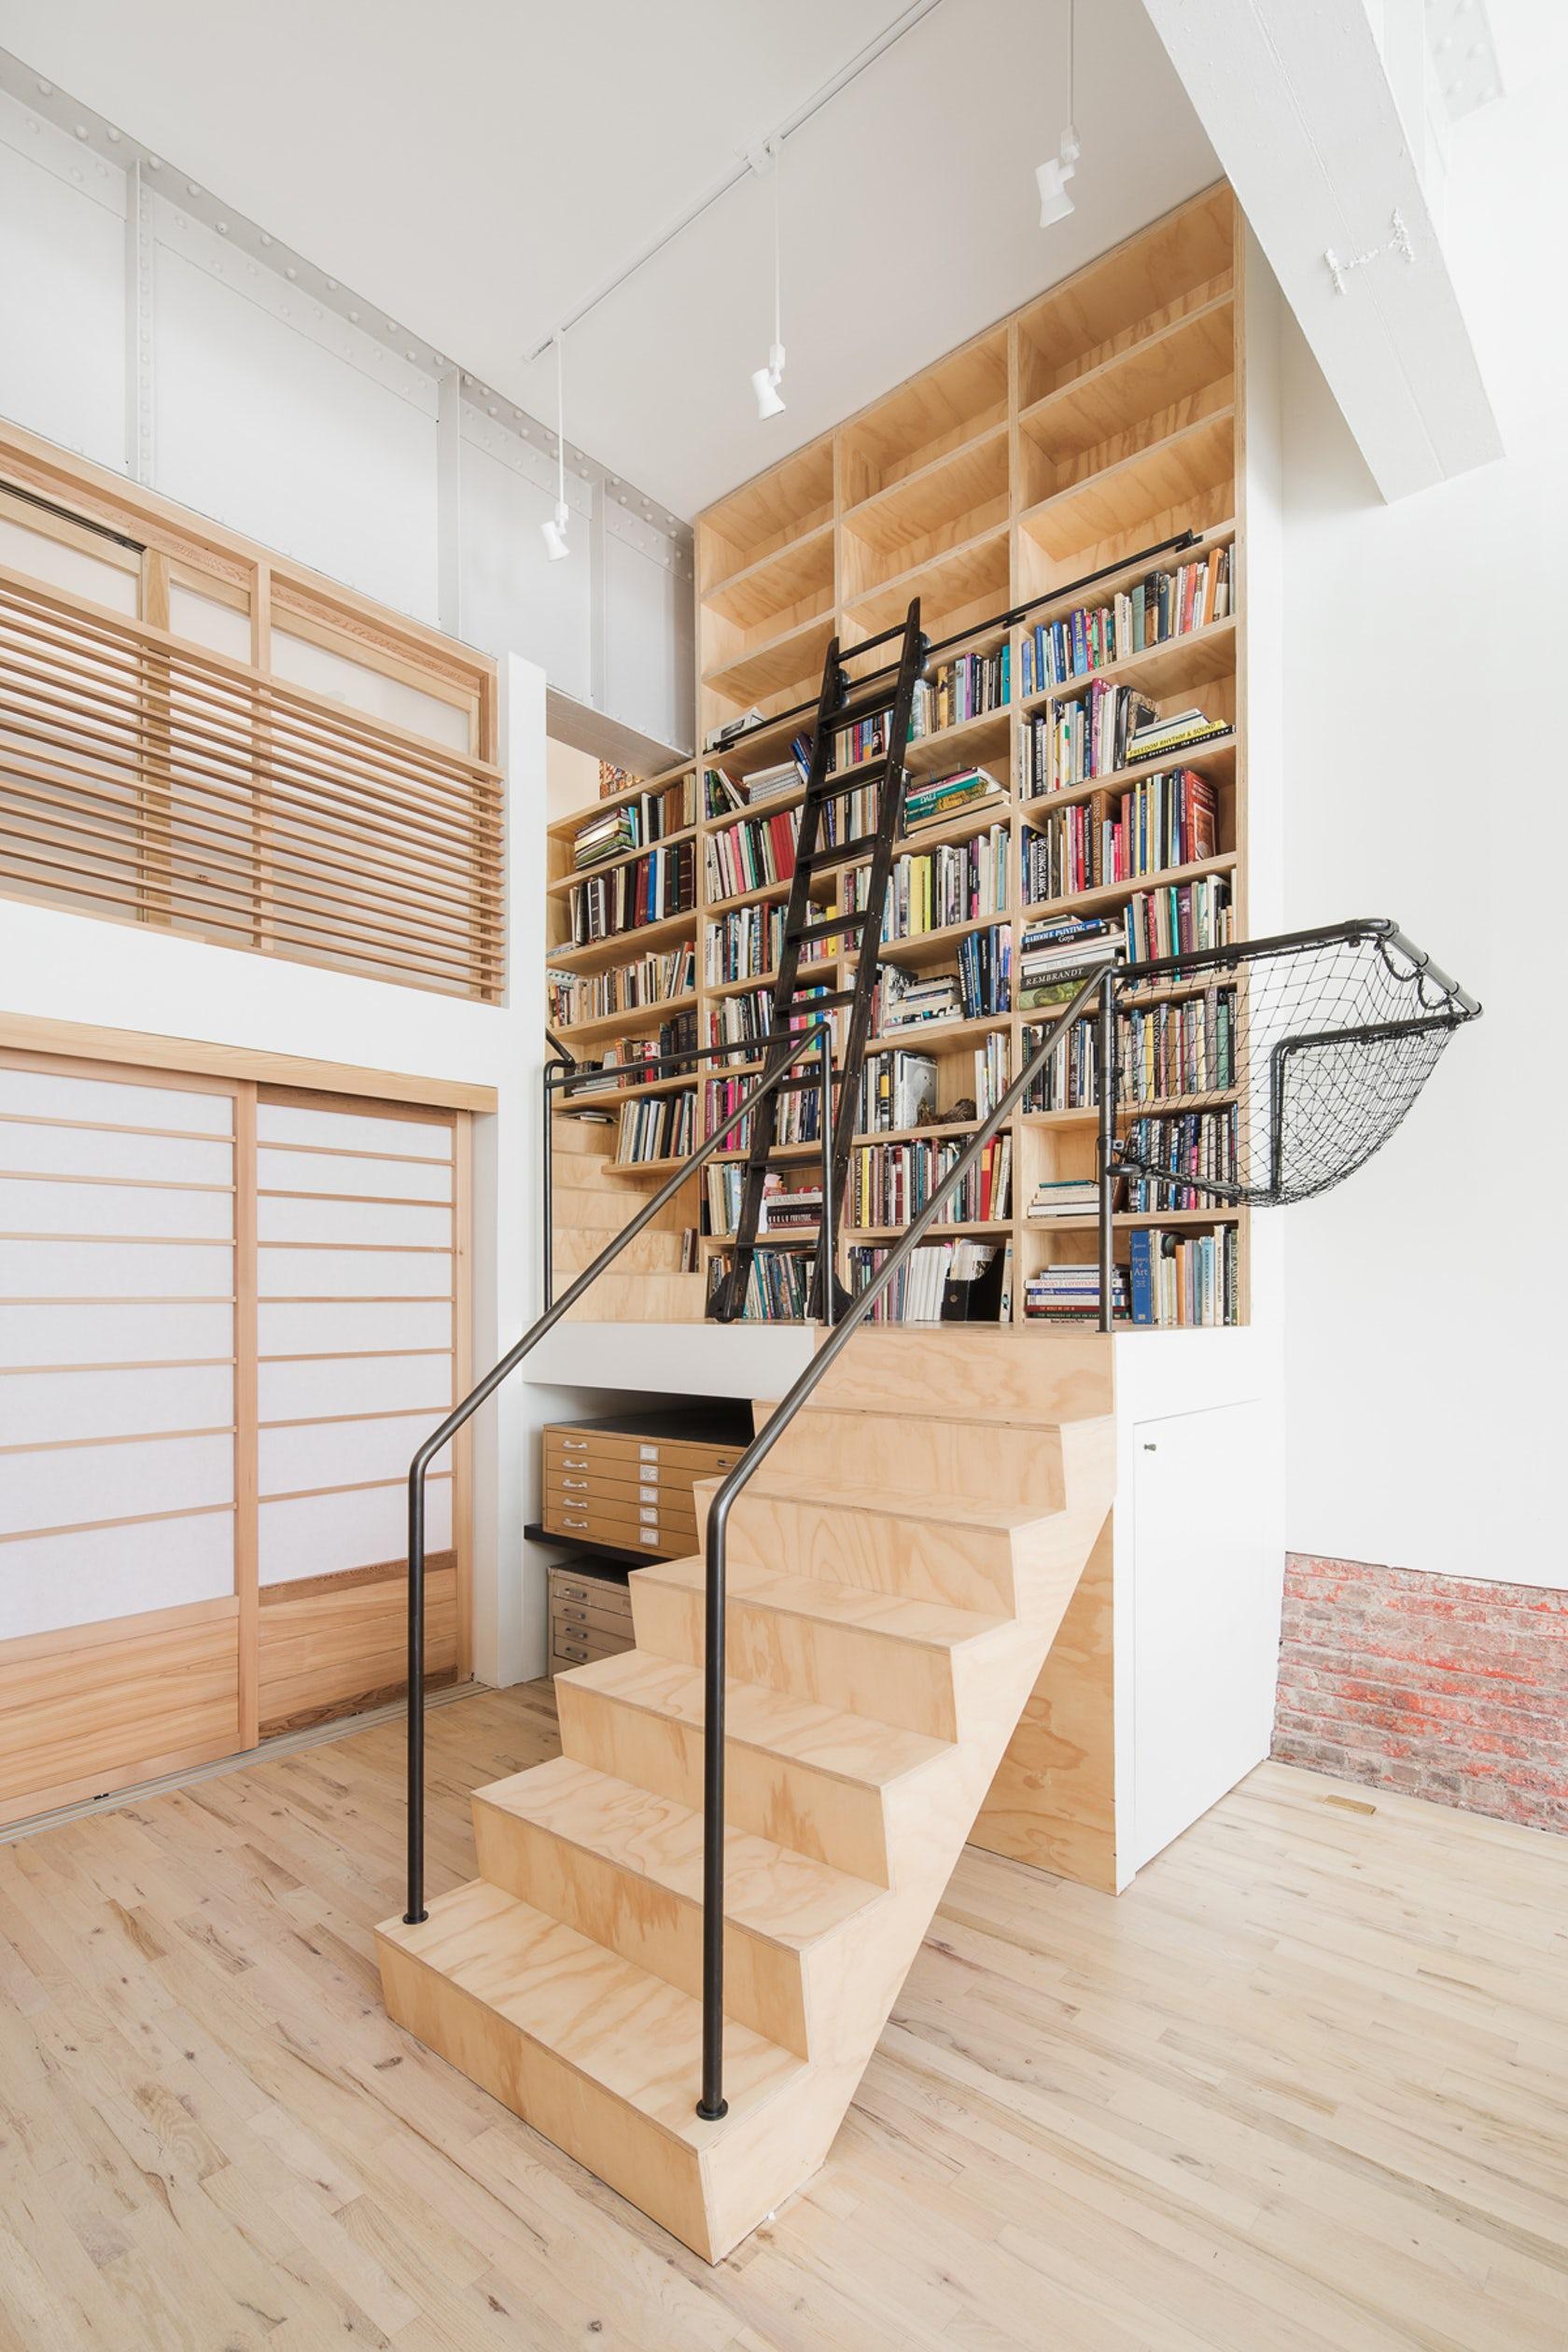 wells fargo loft, jeff jordan architects, jersey city lofts